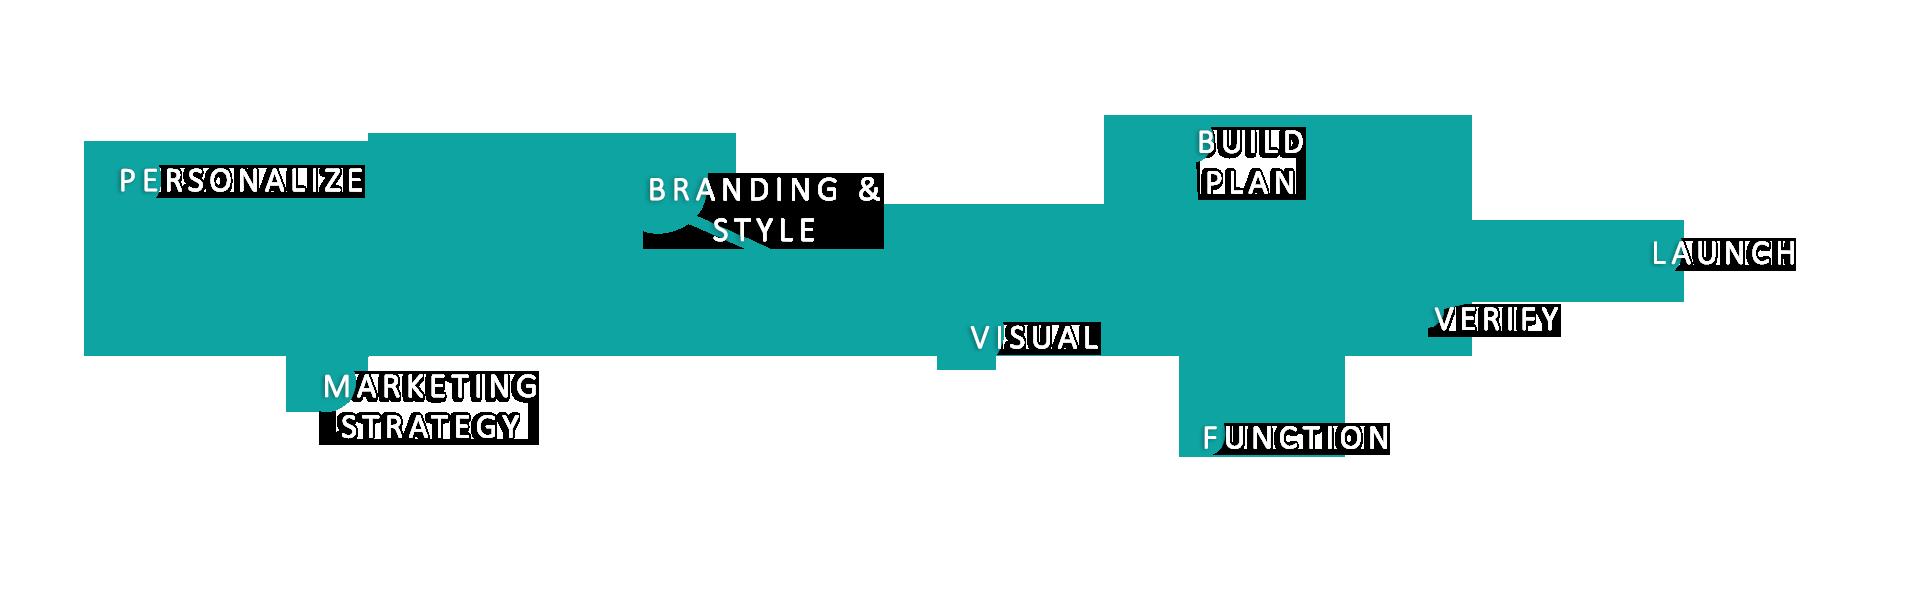 B2B Website Design Process Image